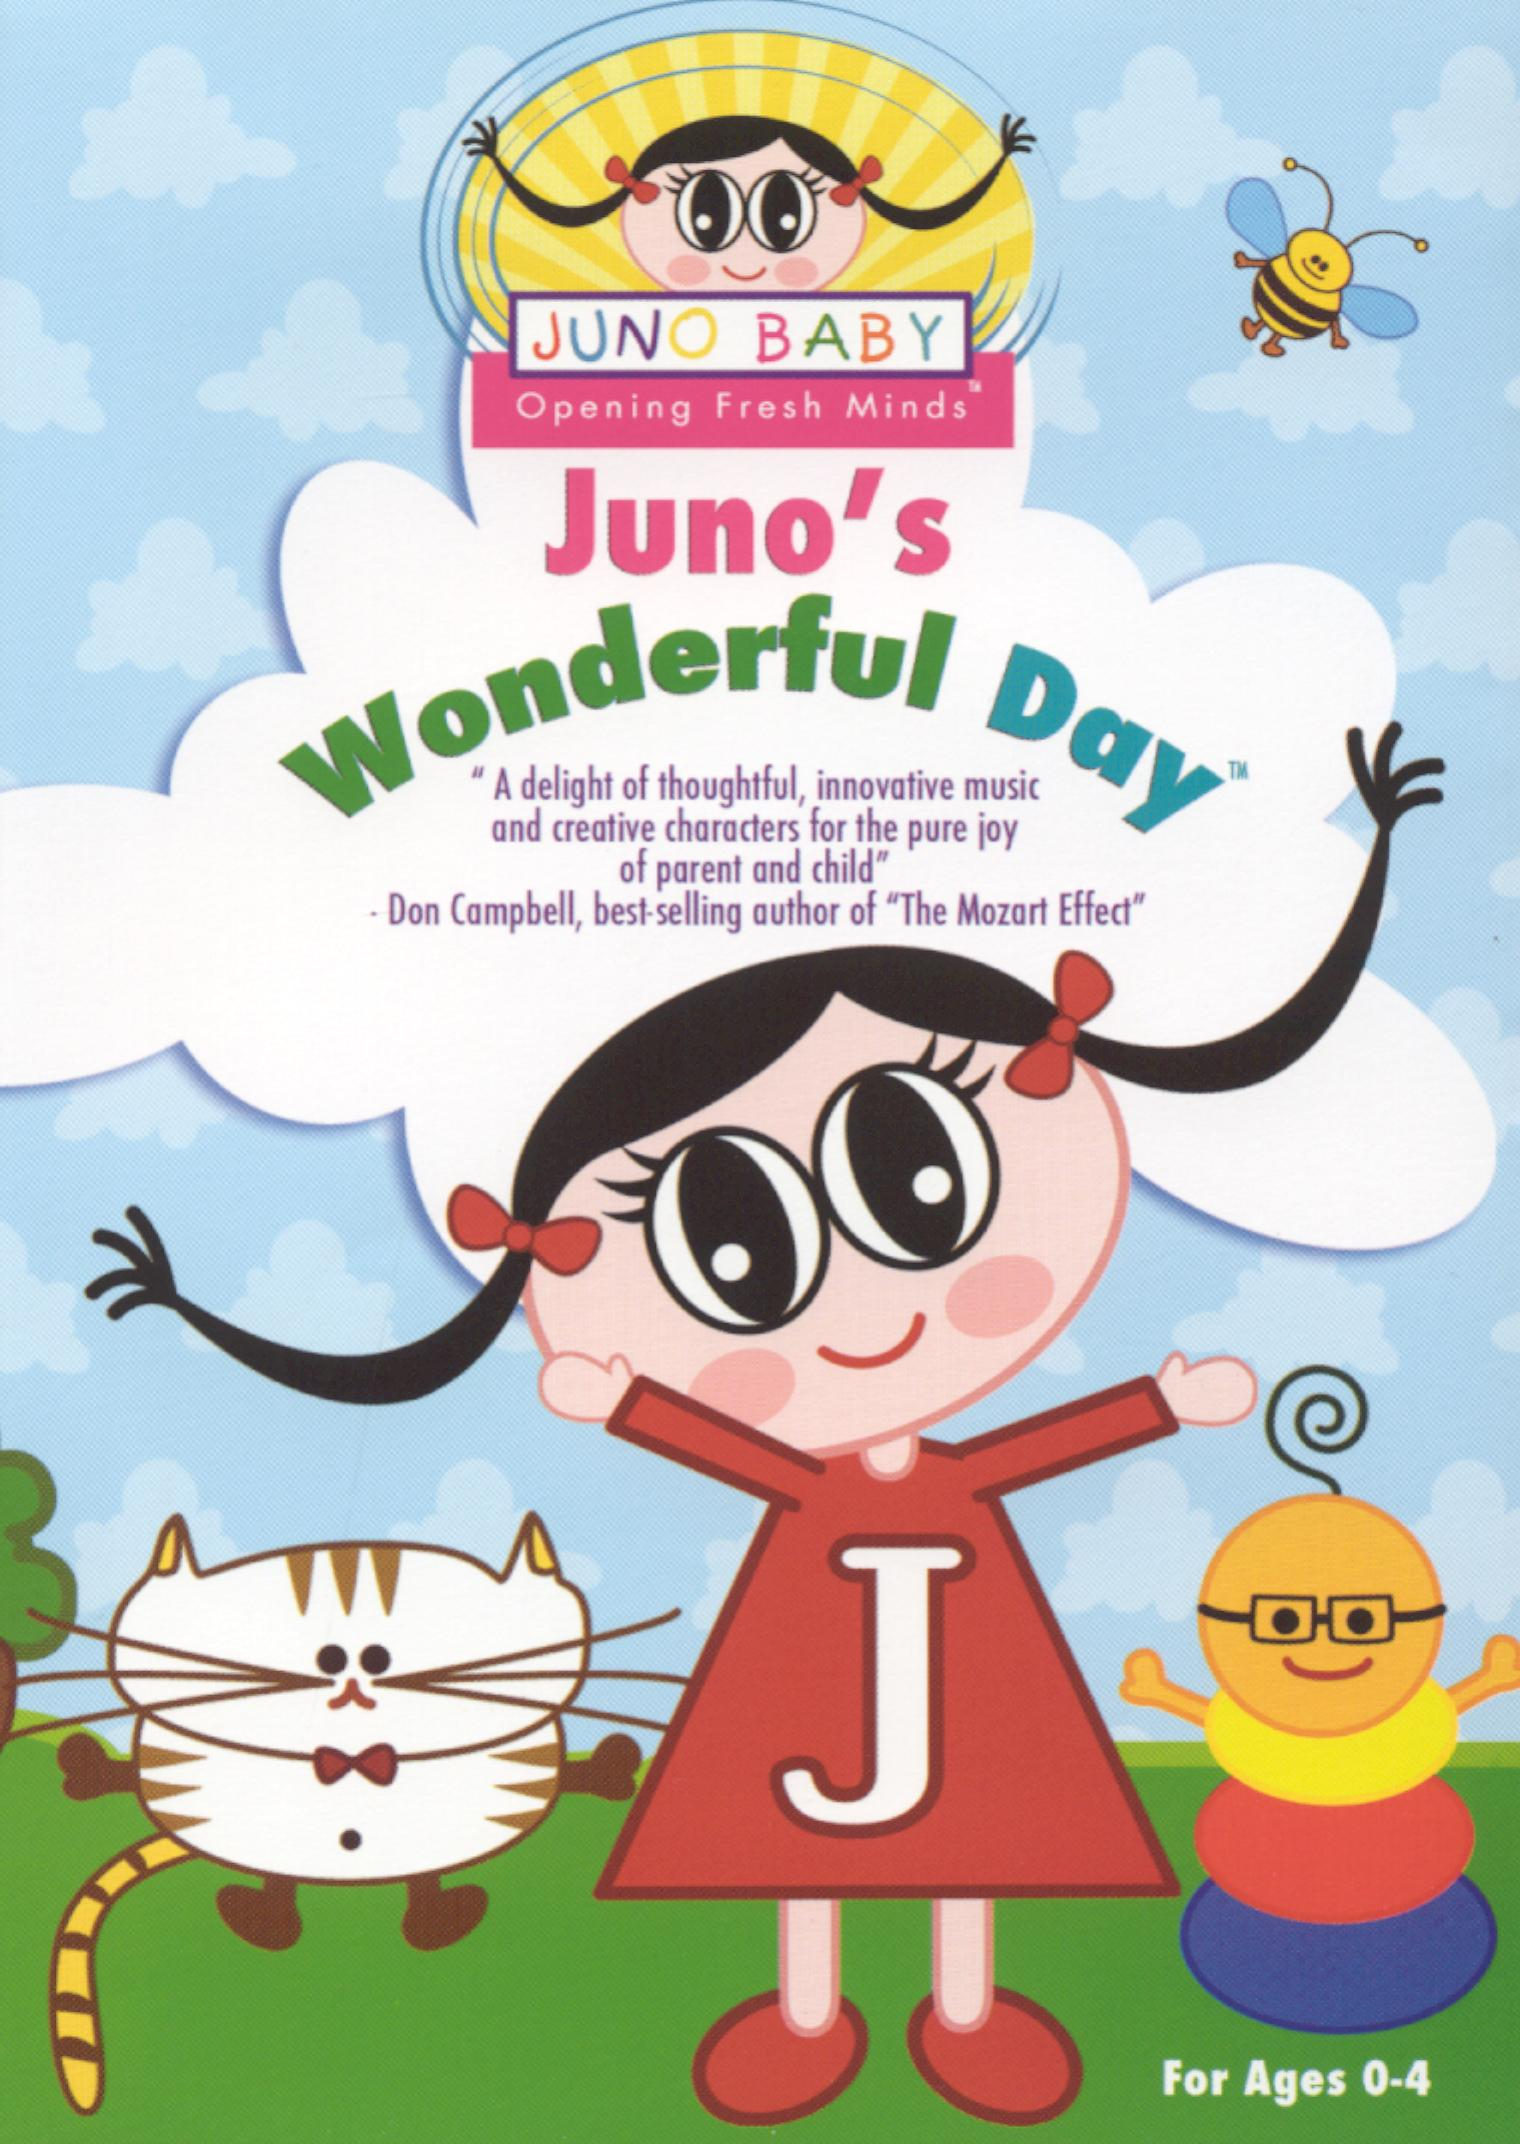 Juno's Wonderful Day